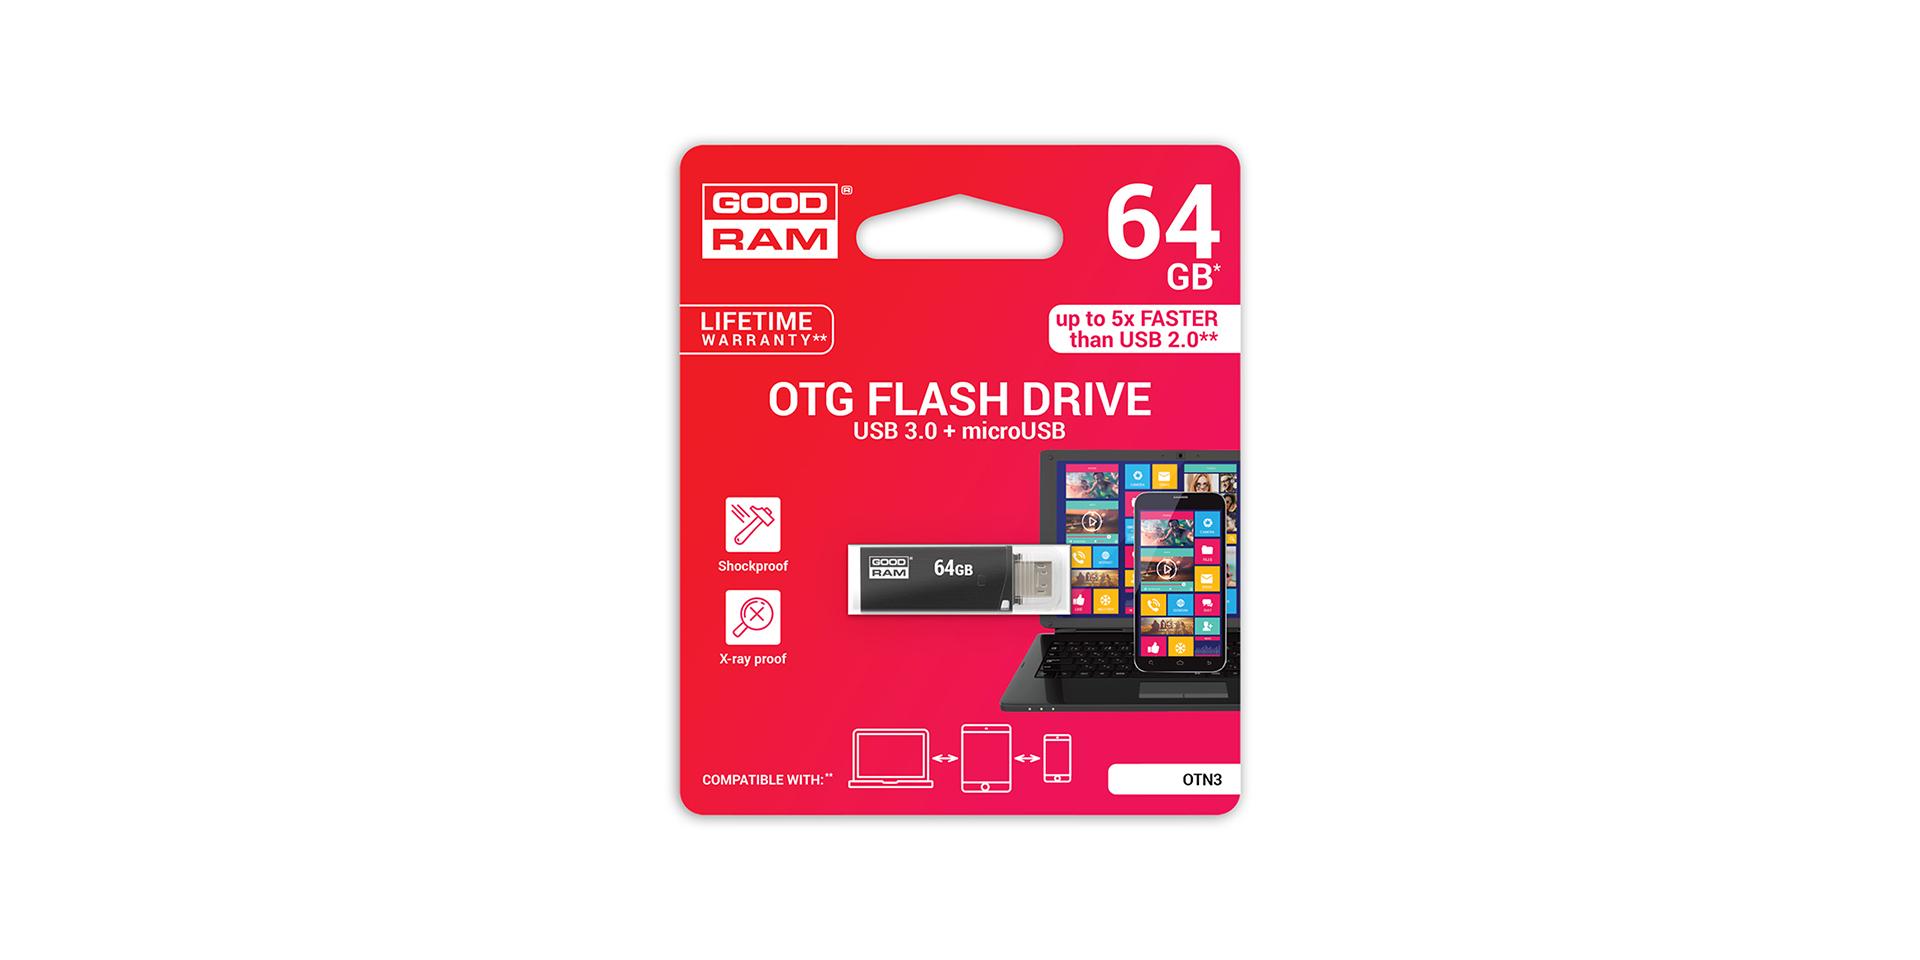 USB OTN3 w blistrze